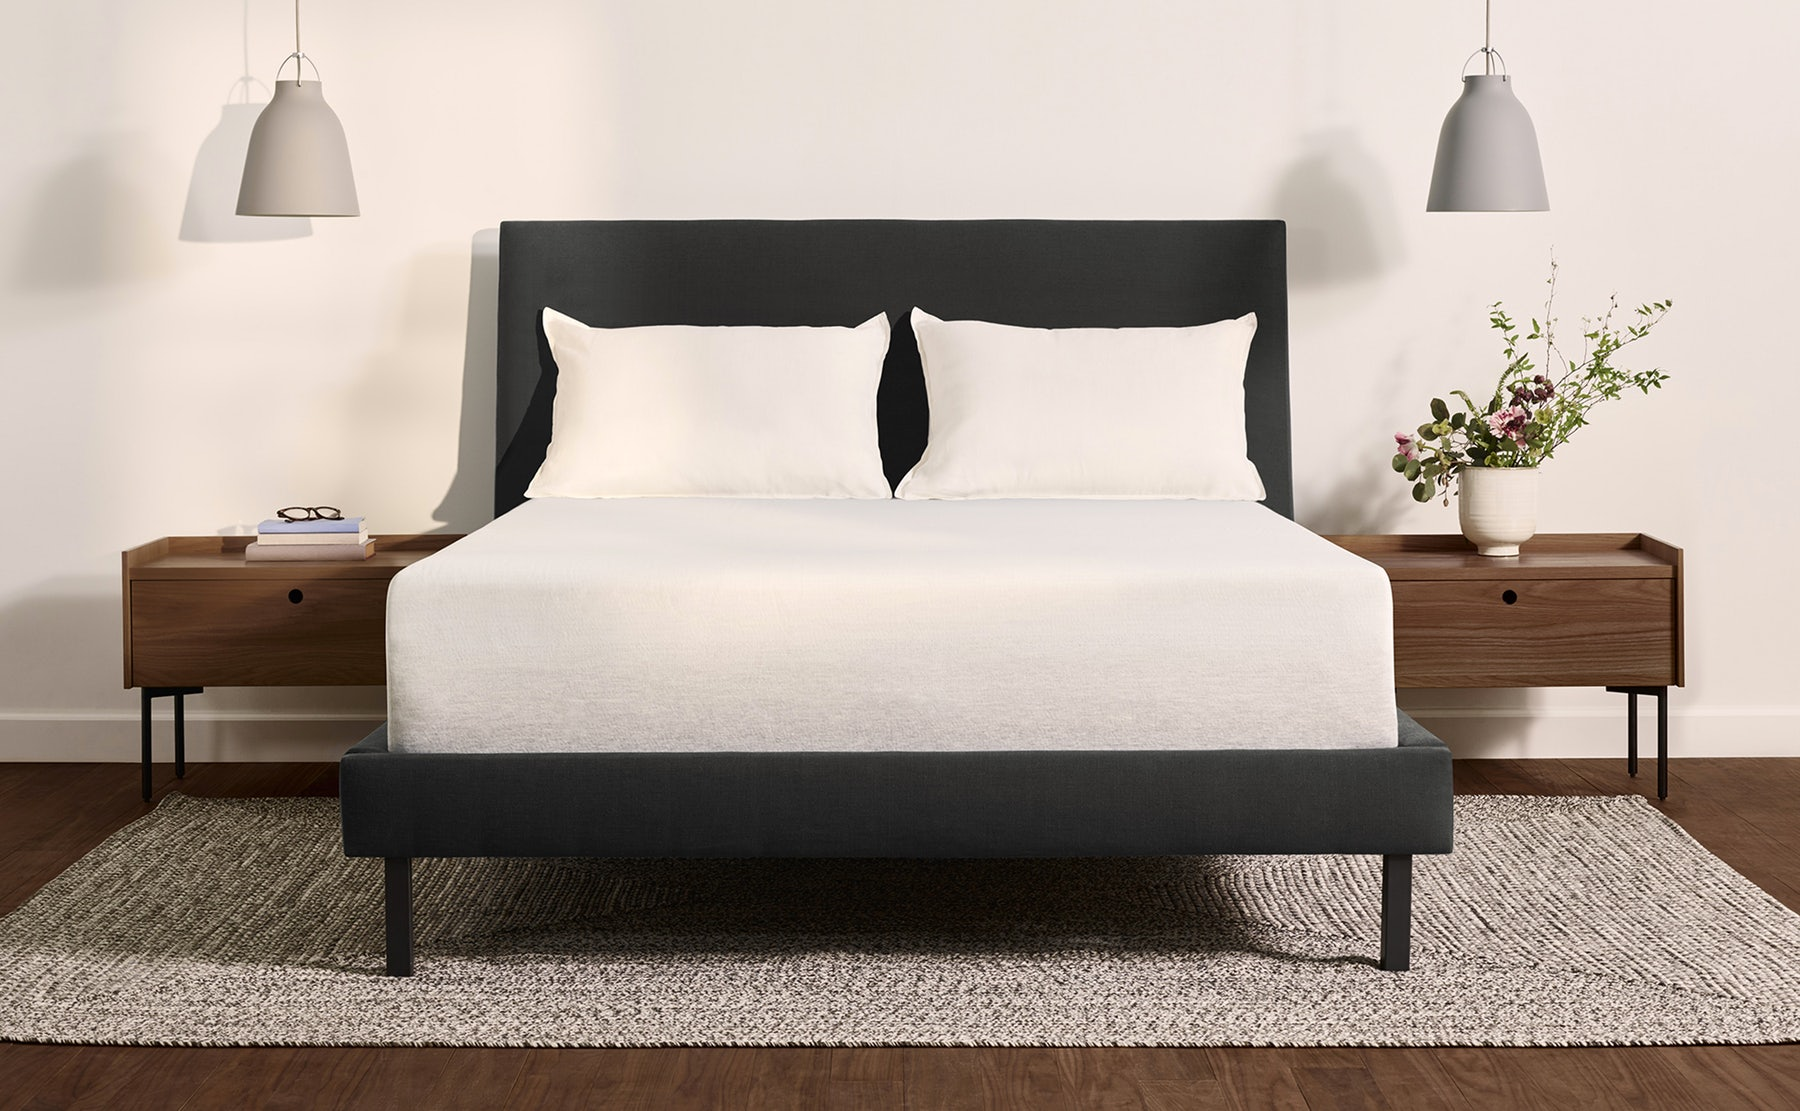 casper wave best side sleepers mattress